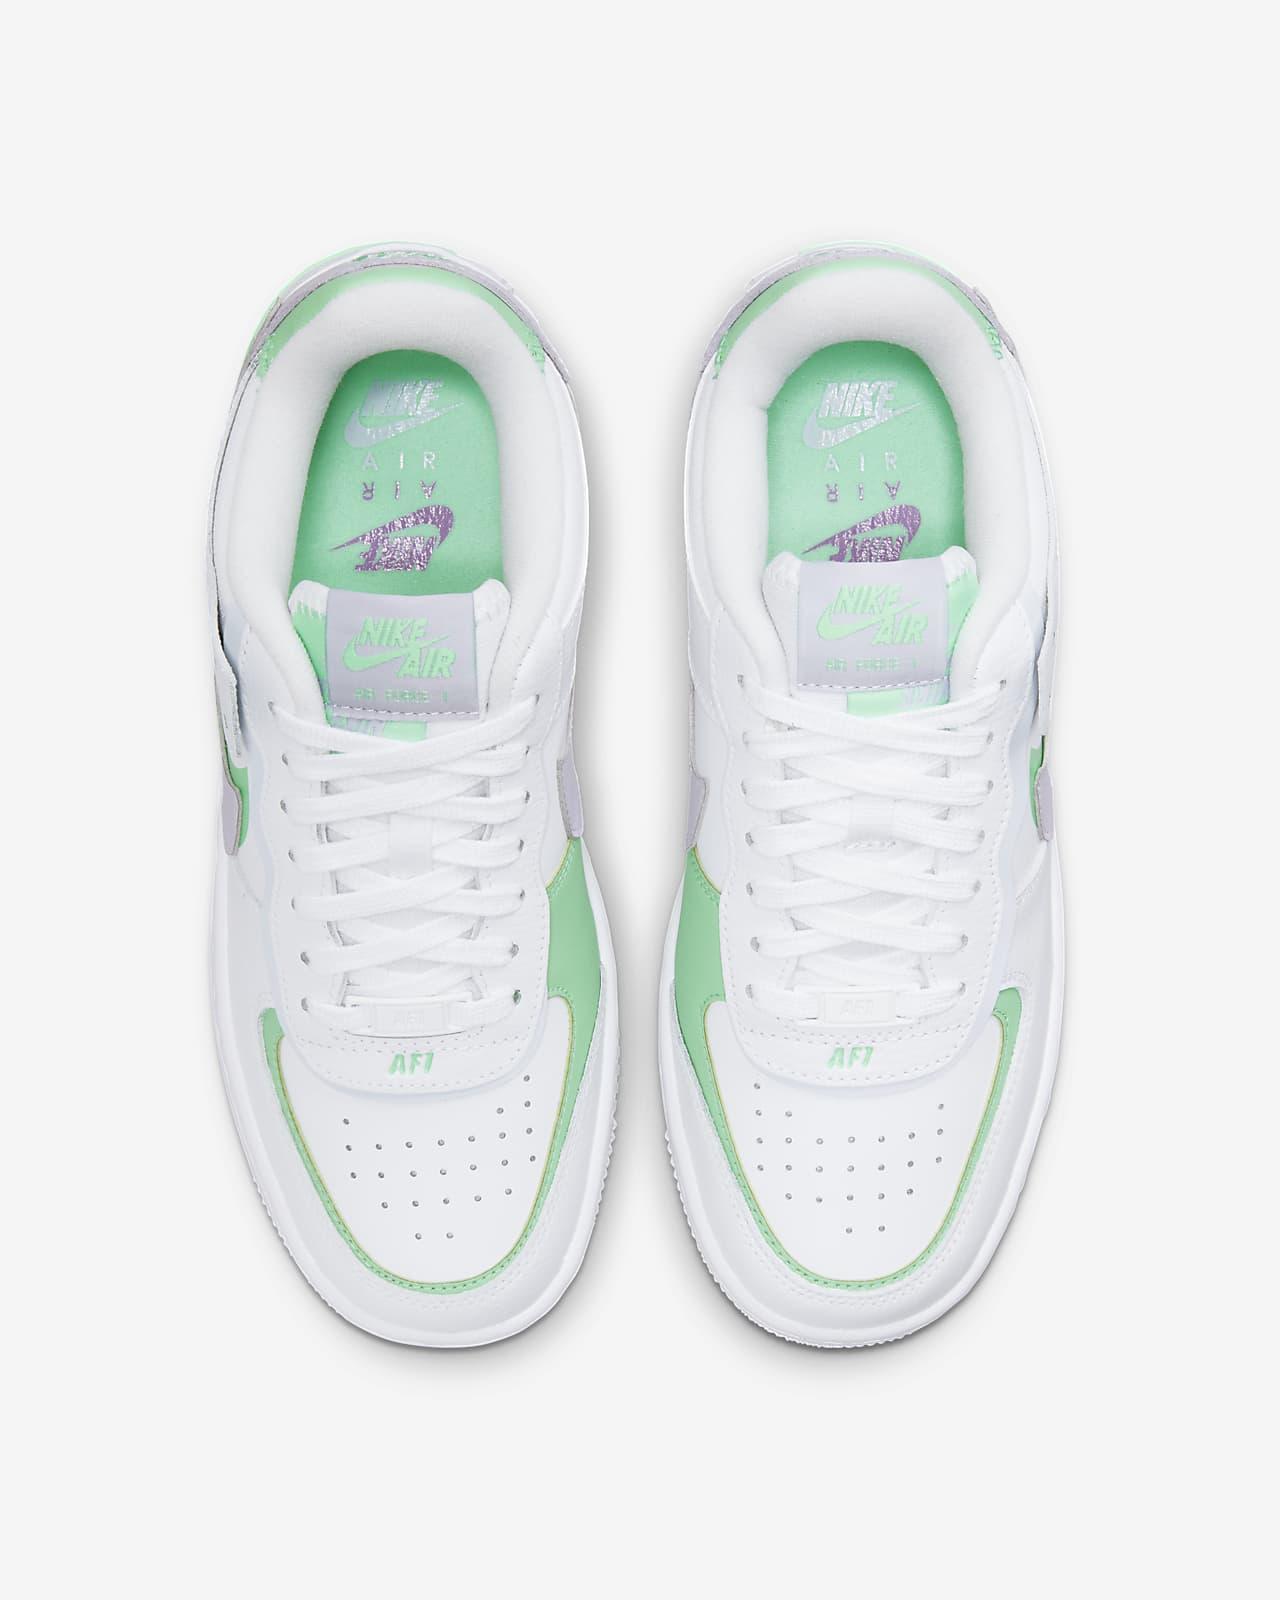 nike air force 1 verdi e bianche